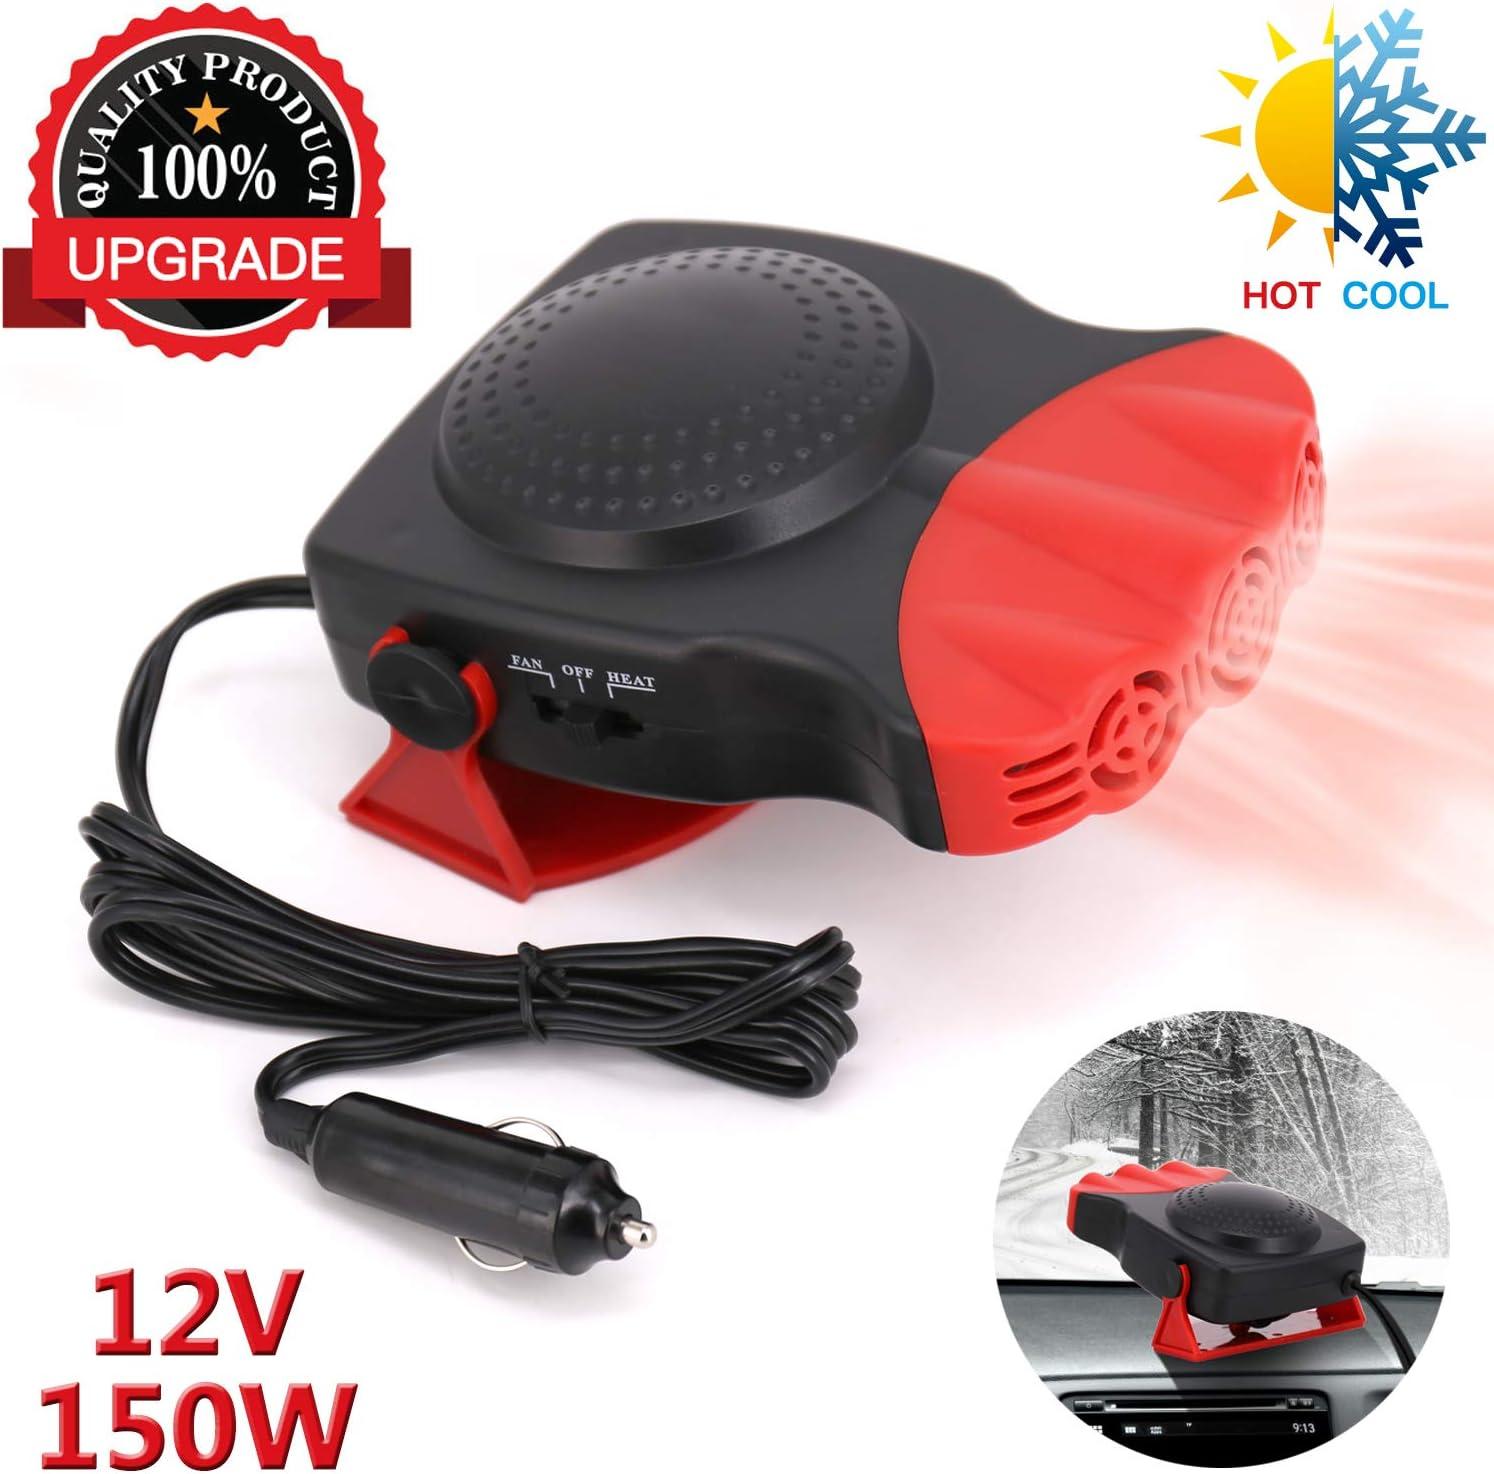 Car Heater Portable Fan Cooler Defrost Defogger Space Automobile Plug Adjustable Thermostat Fast Cooling Heating12V Red